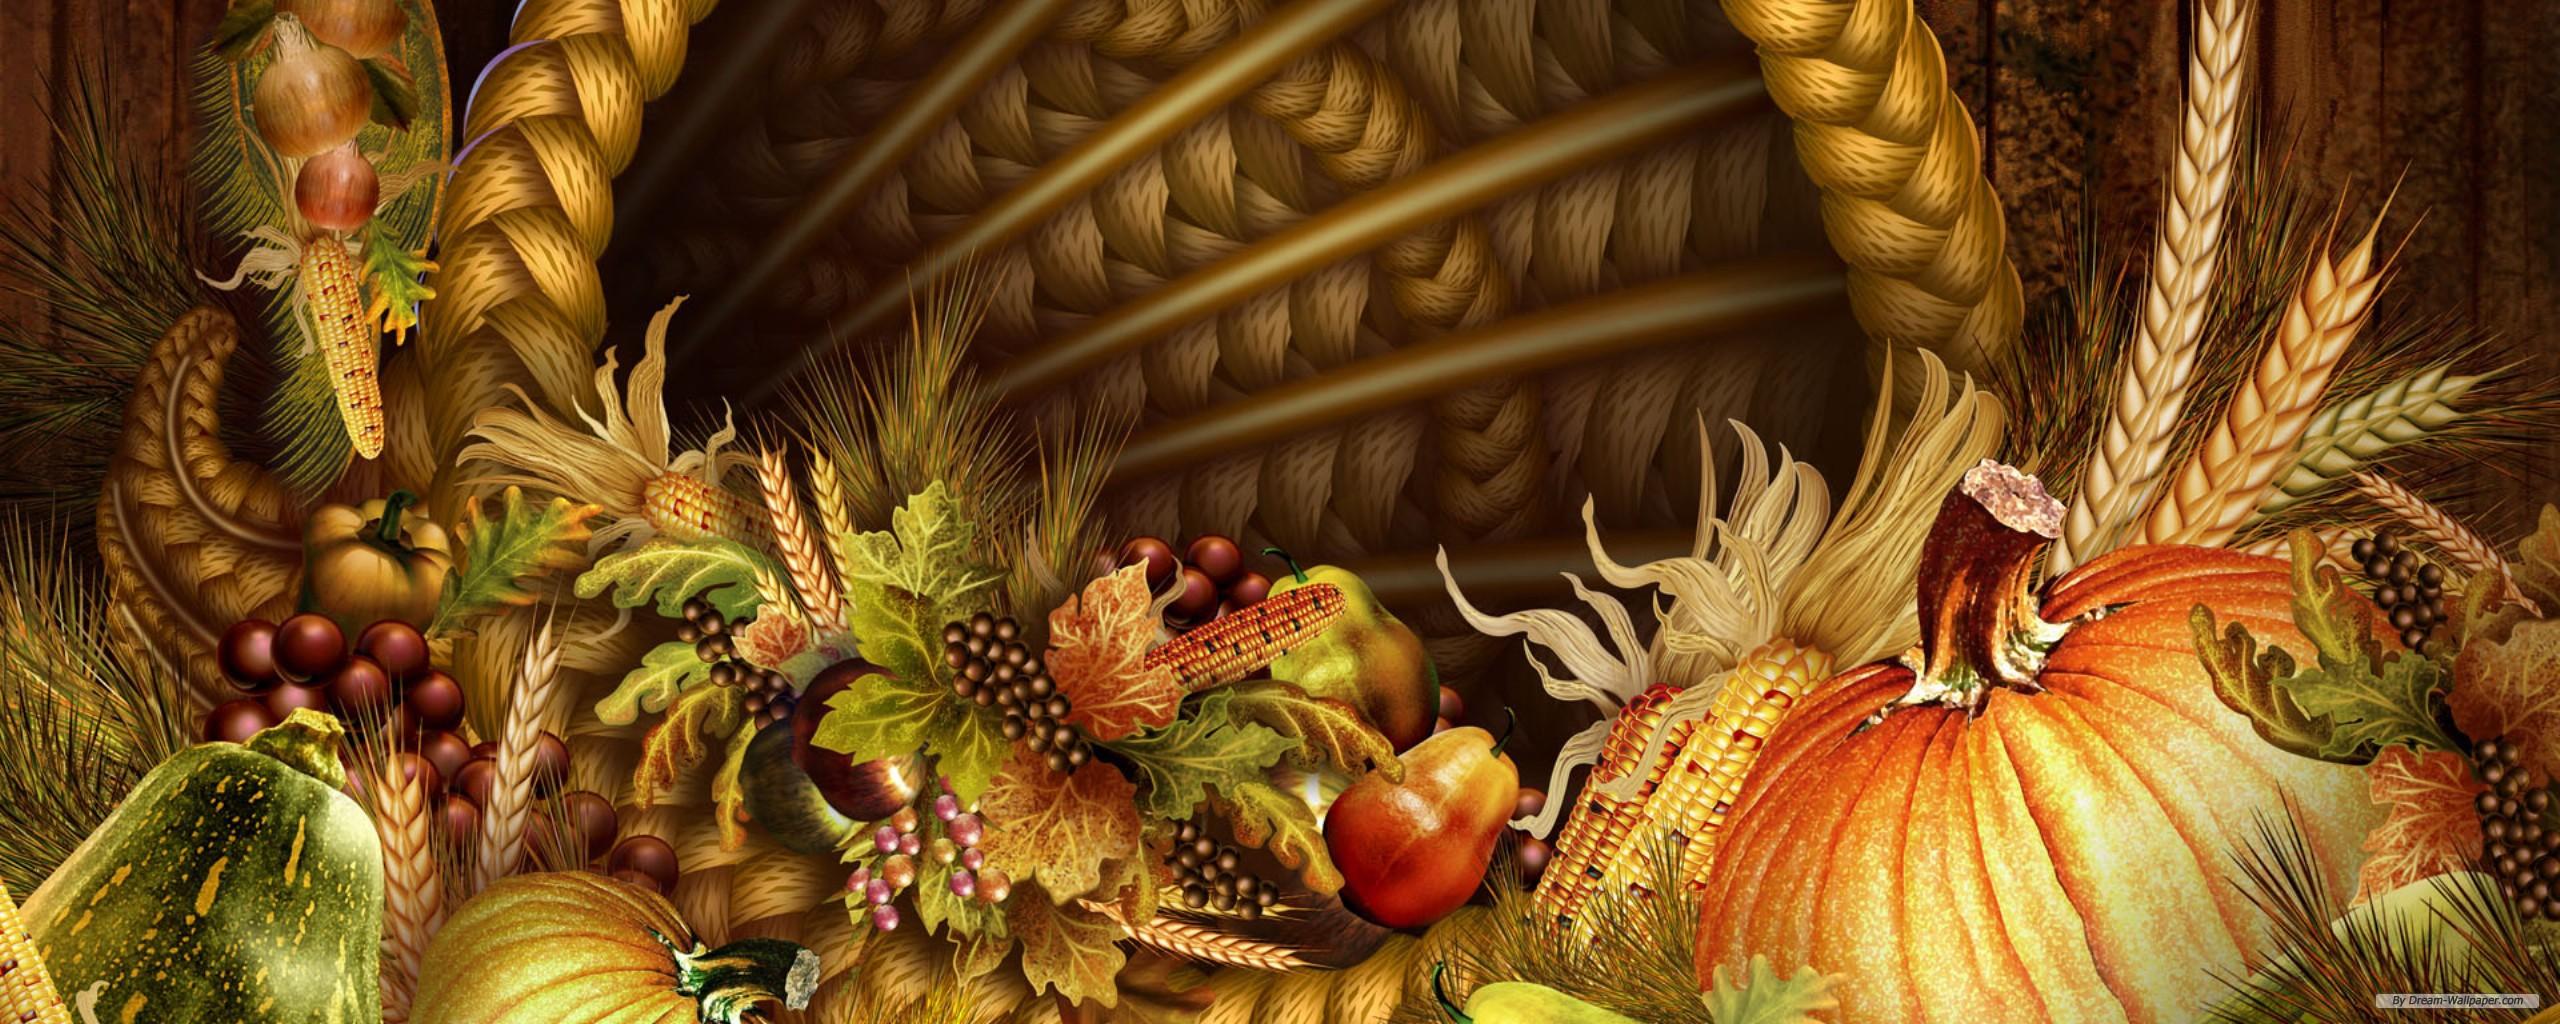 Digital blasphemy wallpaper thanksgiving